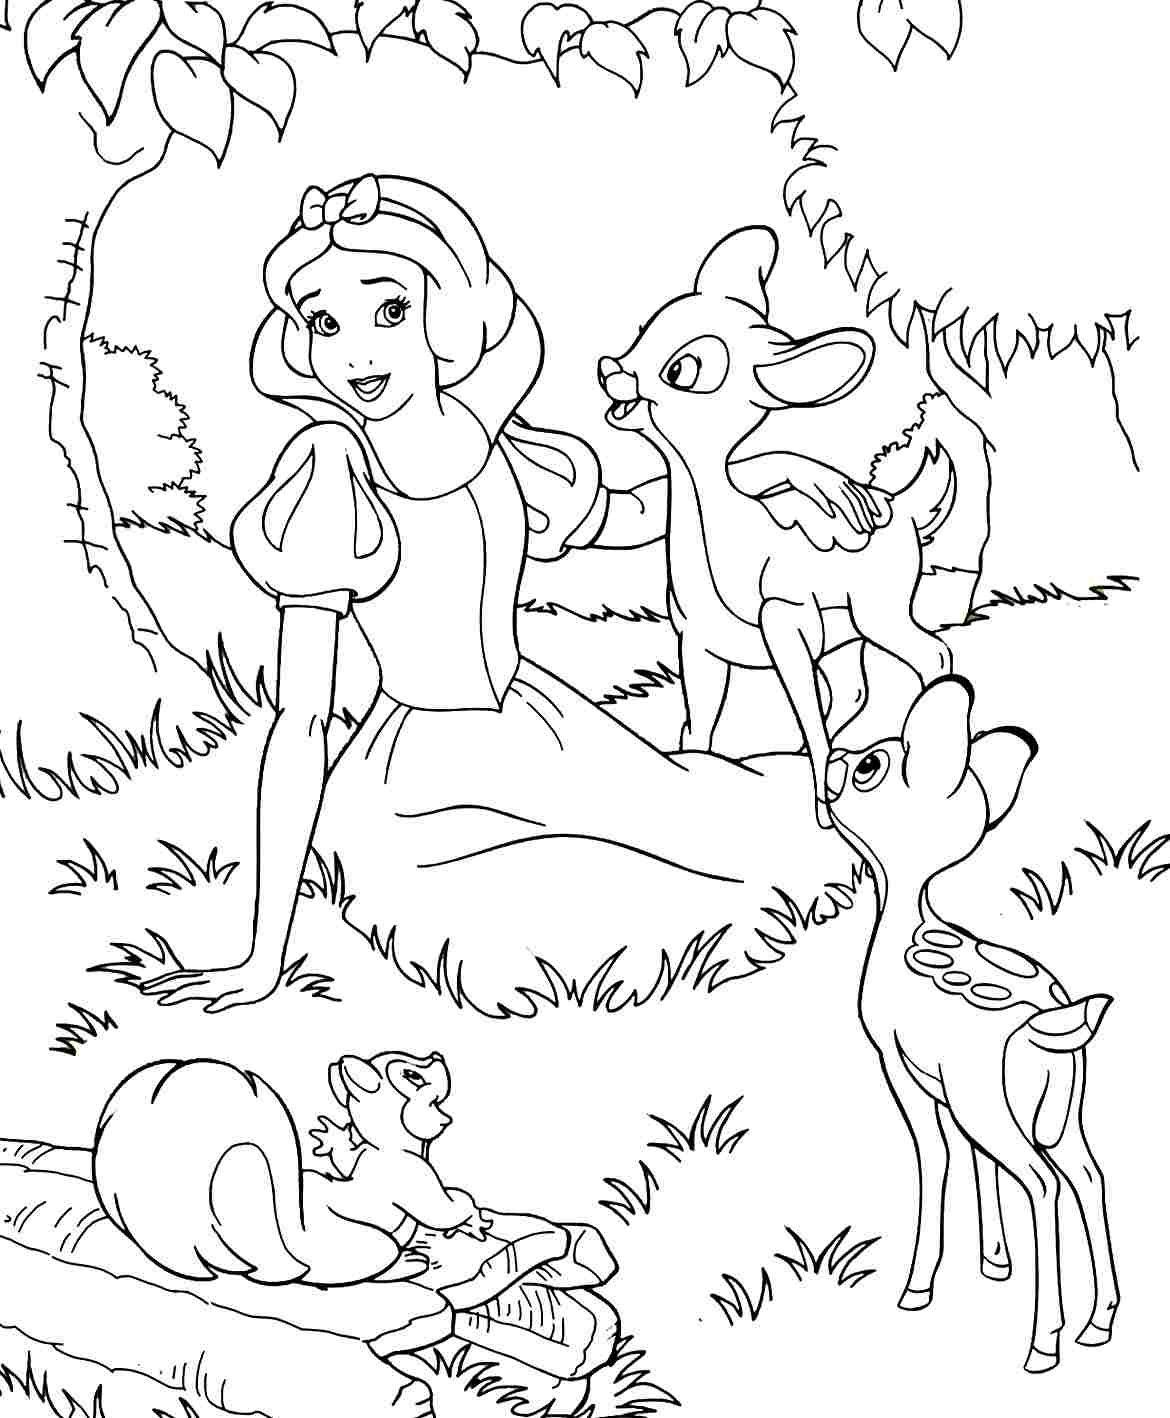 Colouring Sheets Disney Princess Snow White Printable Free ...